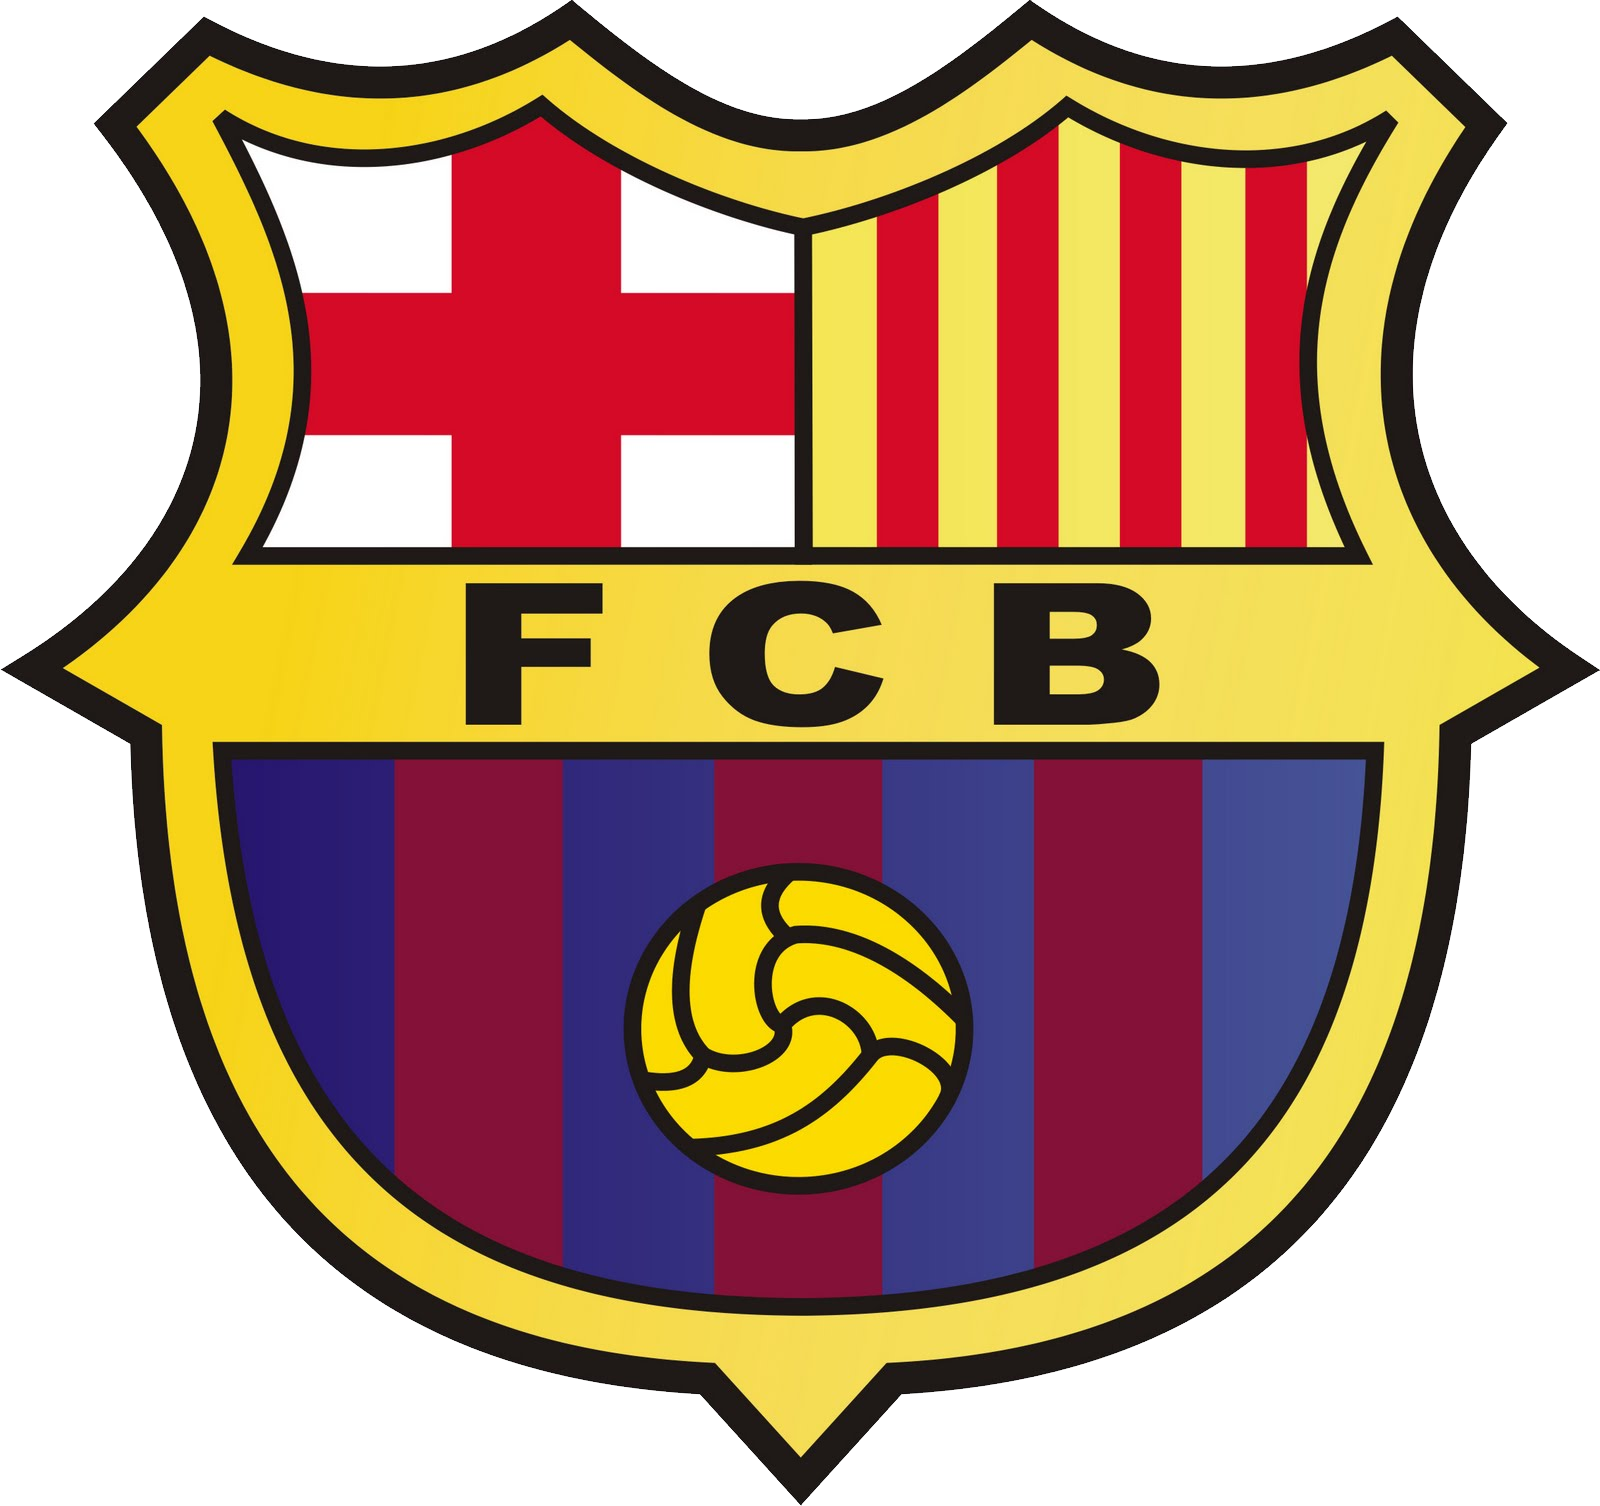 FC Barcelona PNG logo, FCB PNG logo free download.